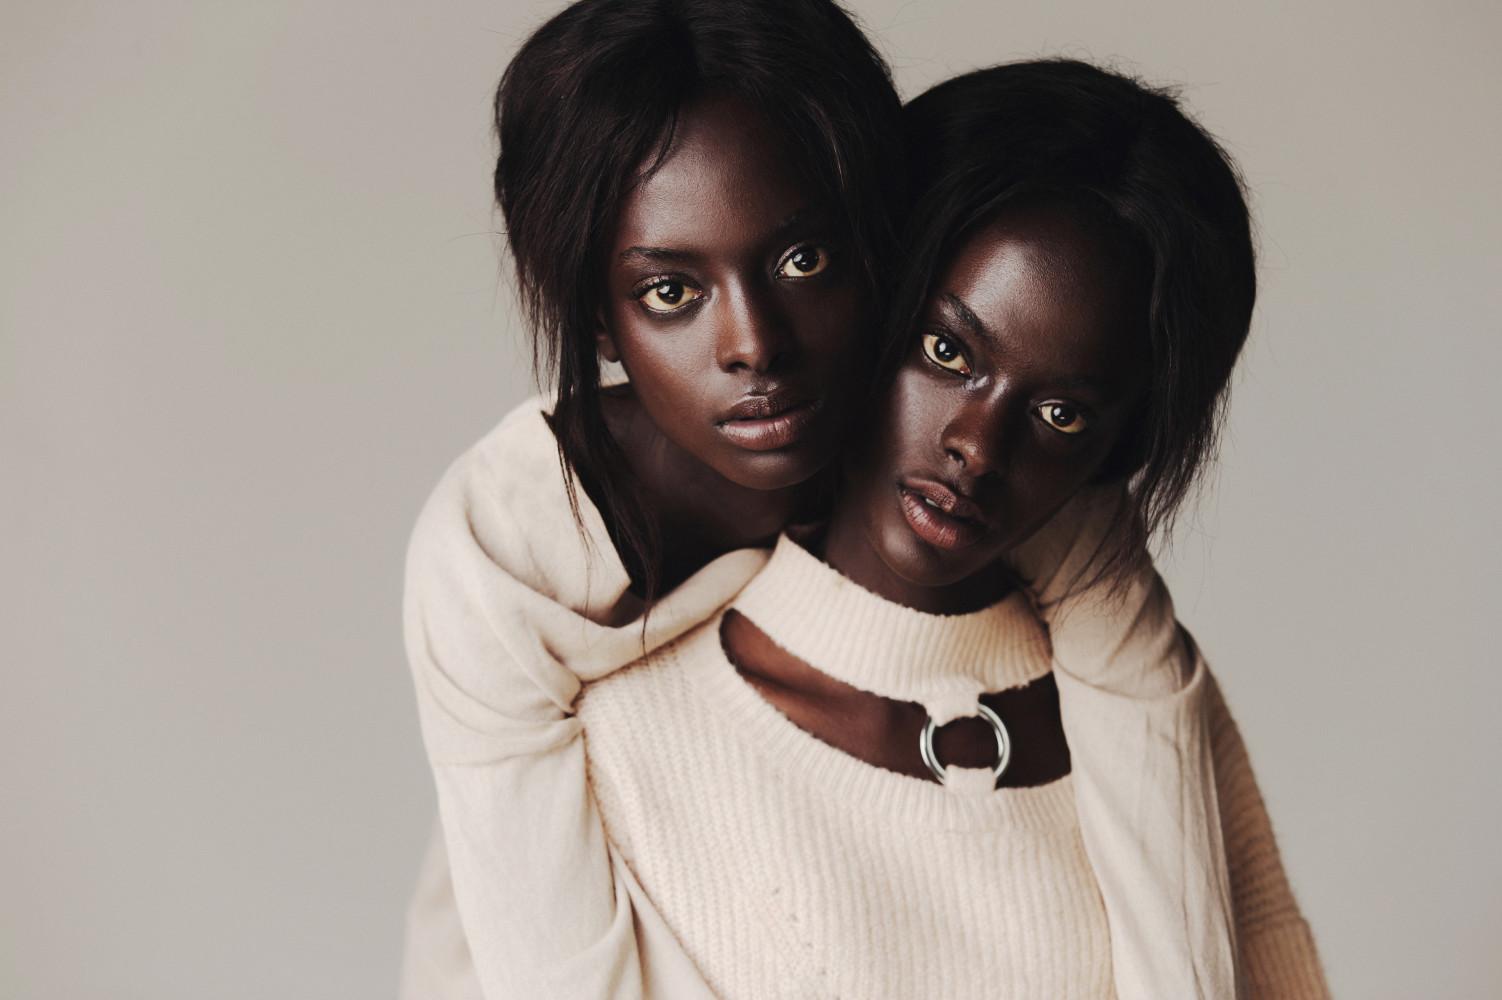 TWINS: Aicha & Marie